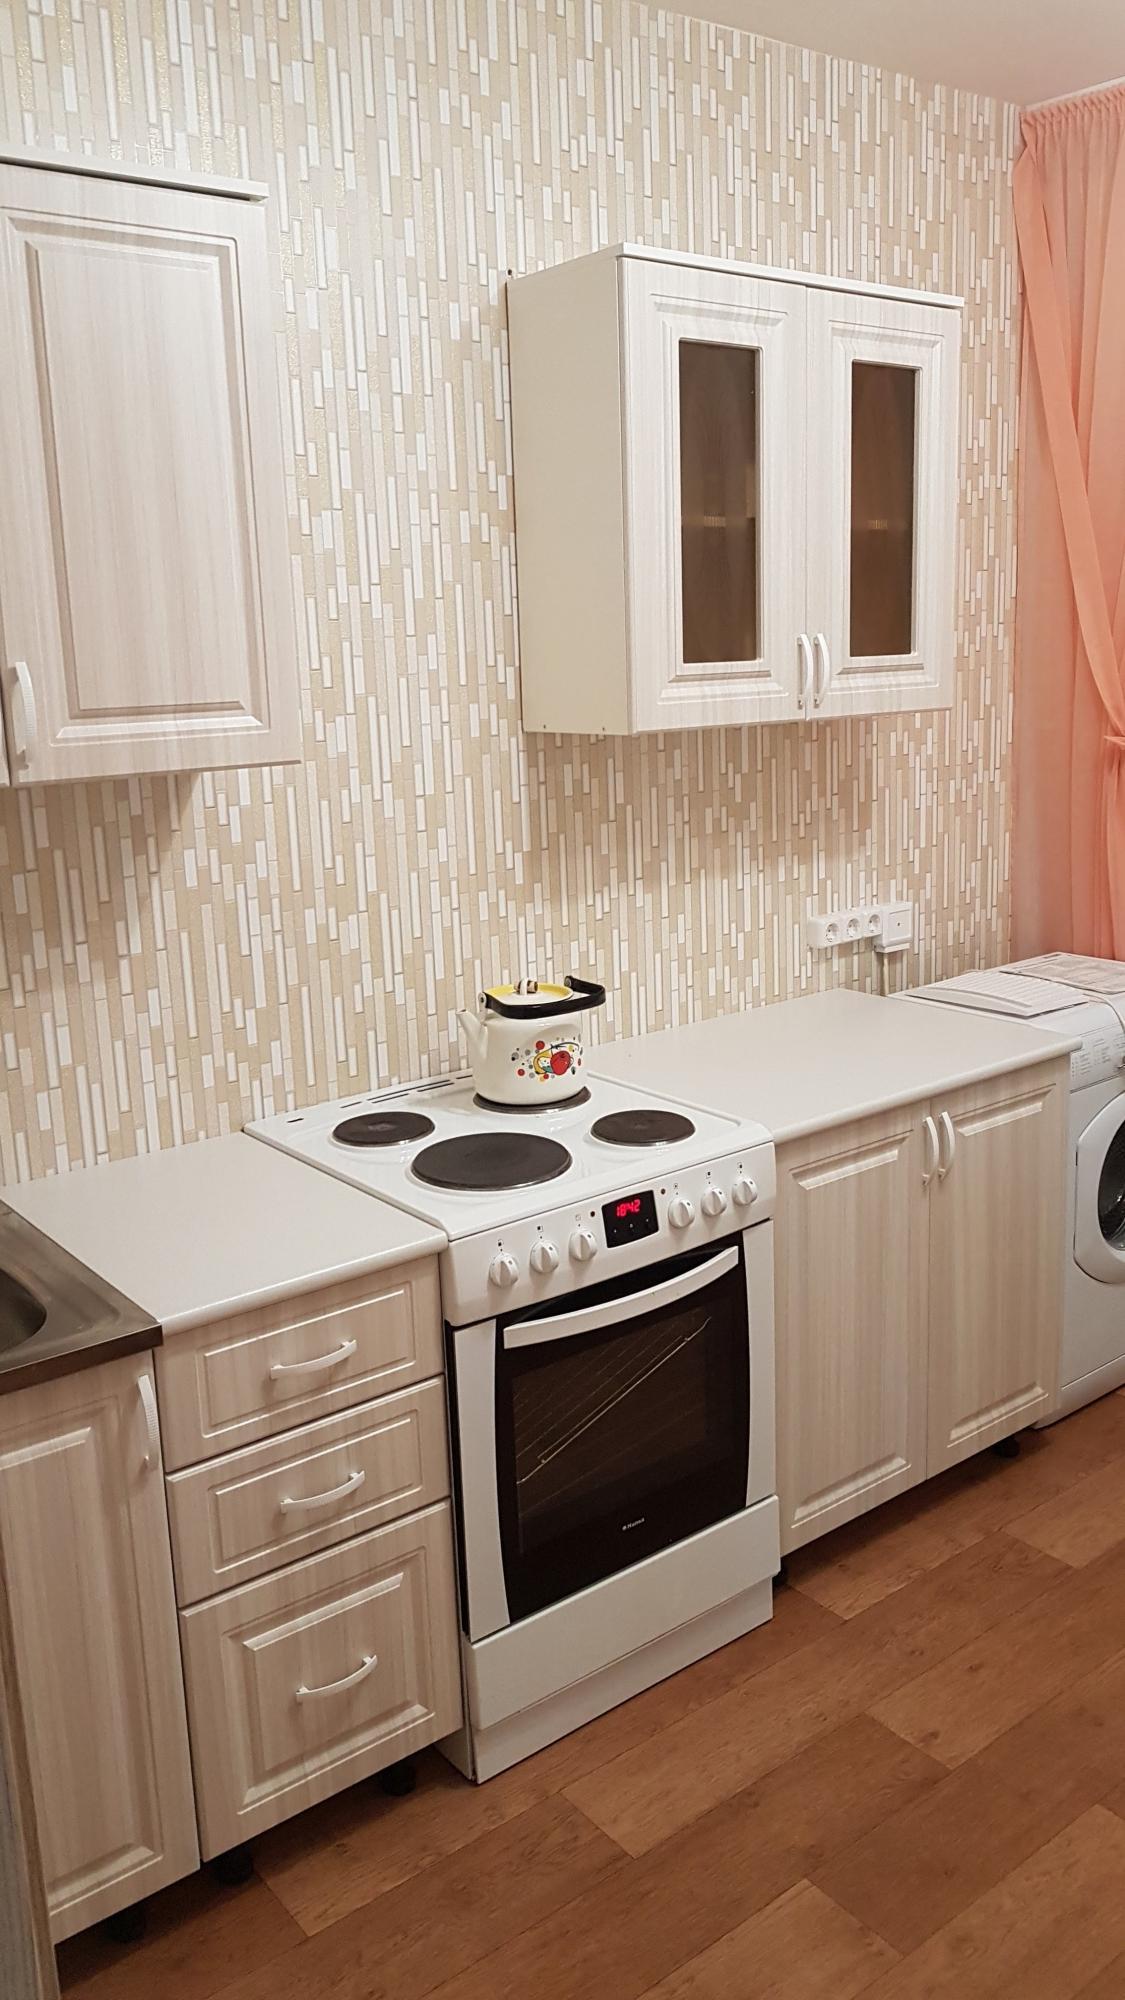 1к квартира улица Партизана Железняка, 61 | 20000 | аренда в Красноярске фото 5